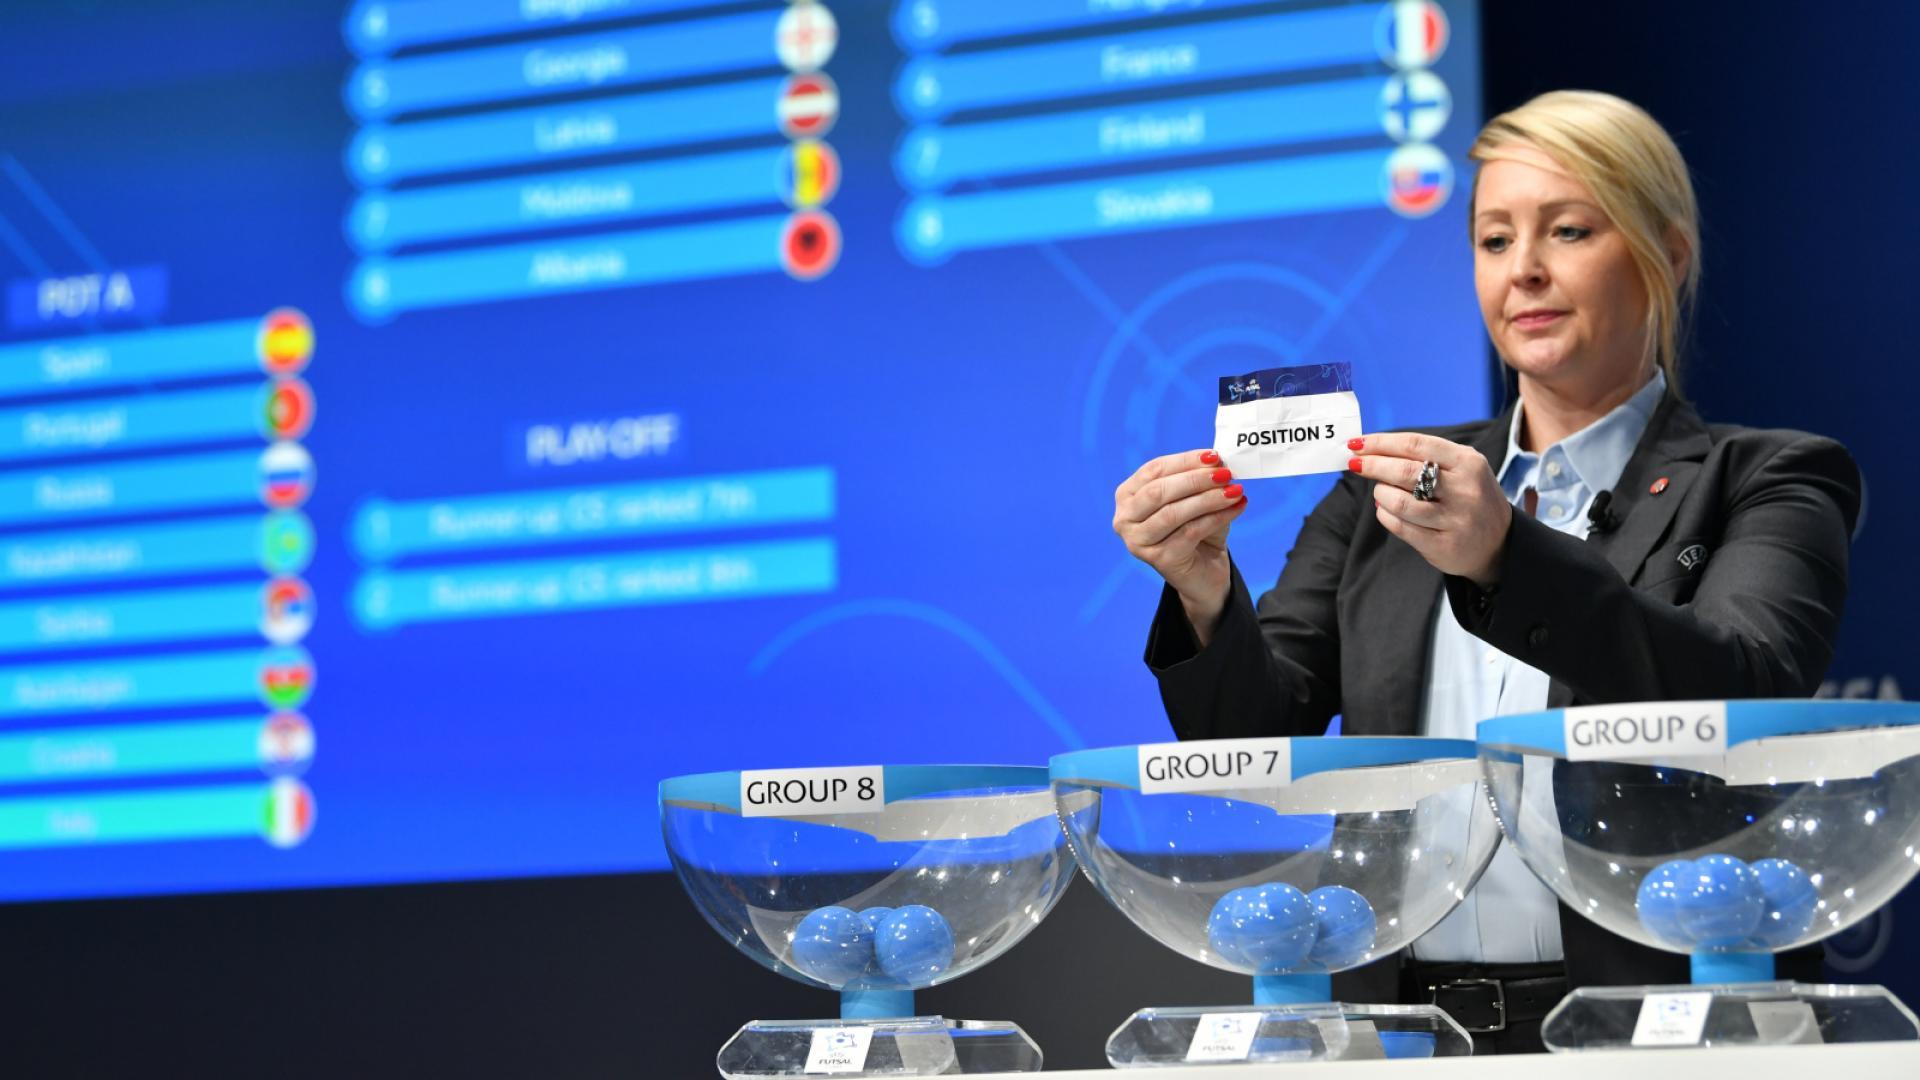 UEFA Futsal EURO 2022